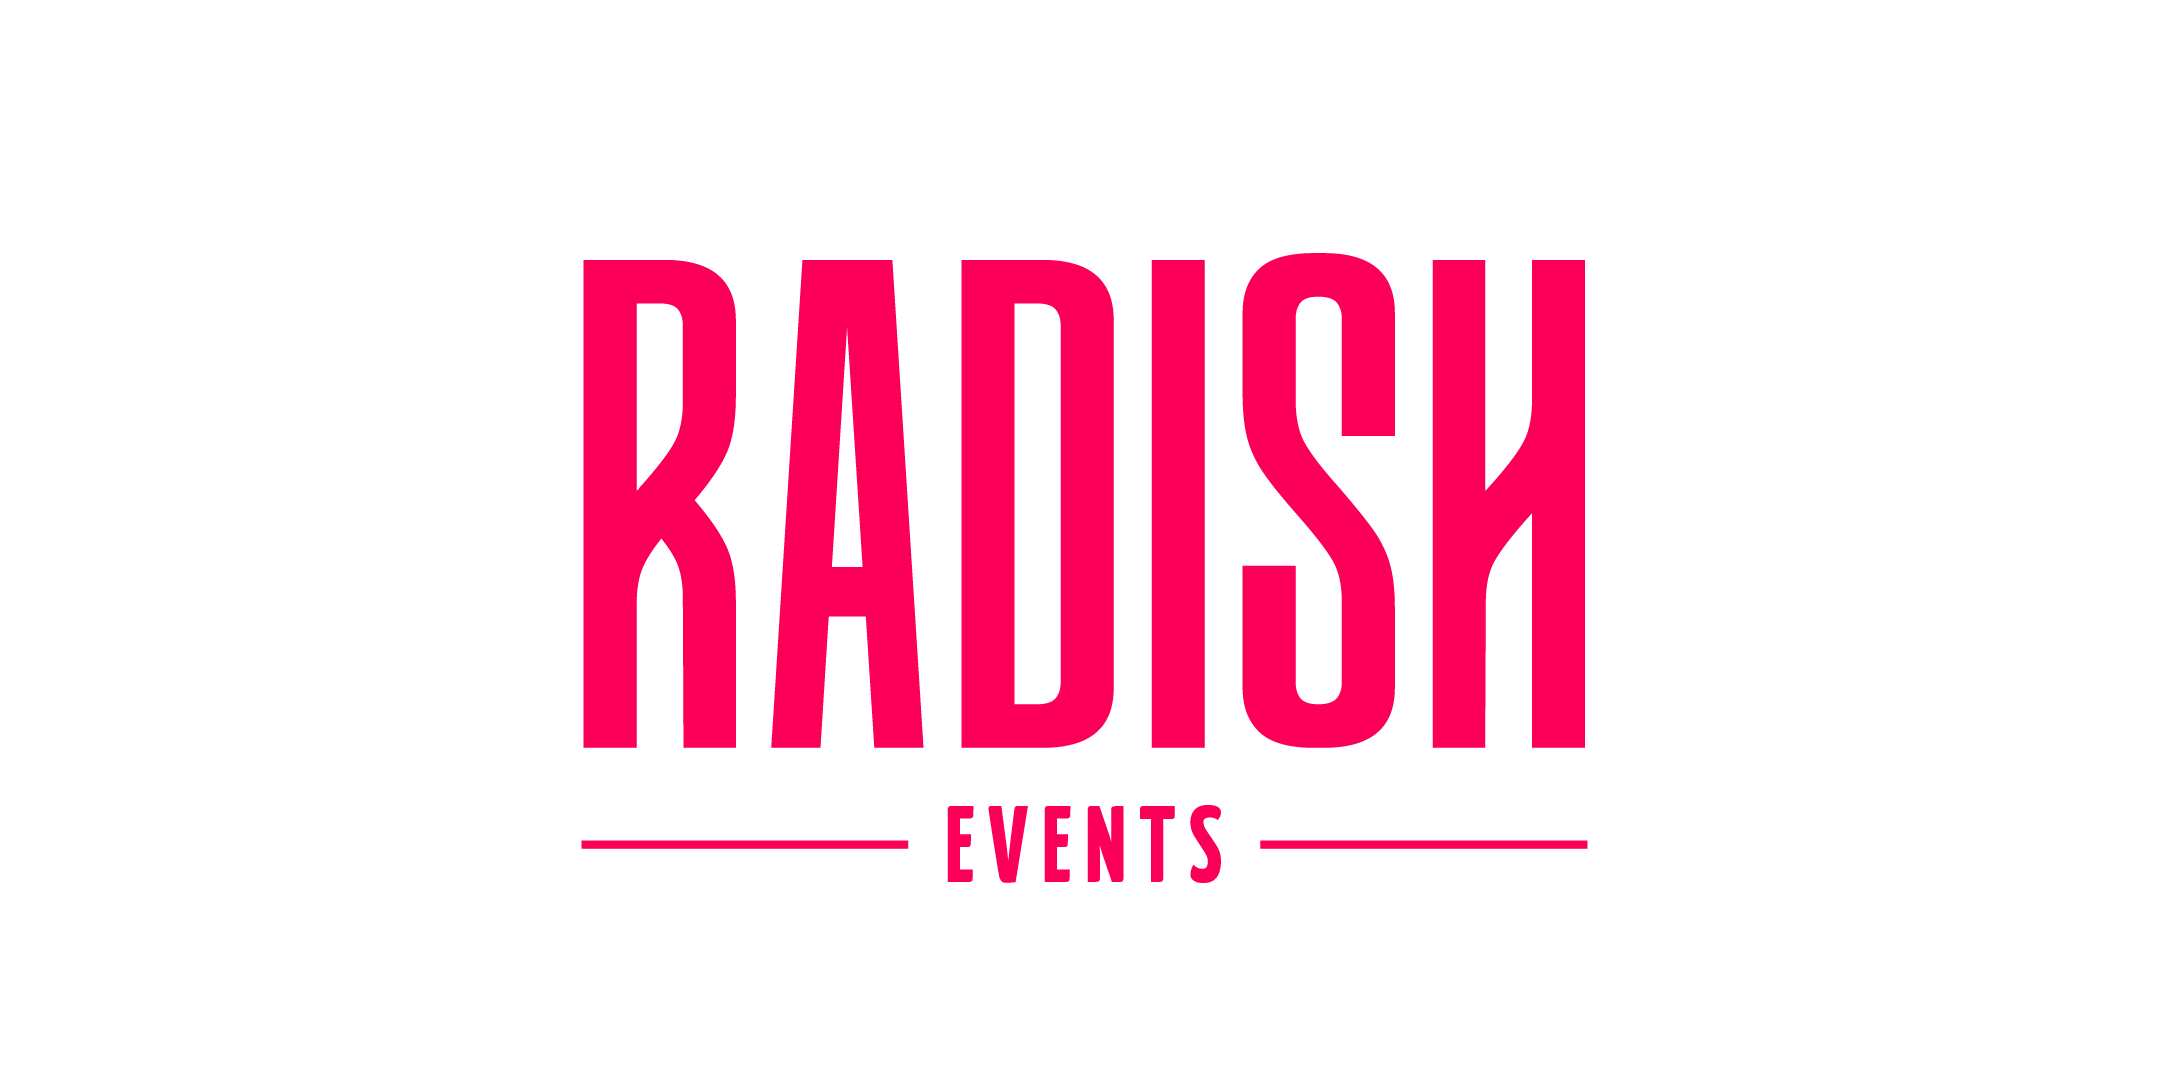 Radish Events